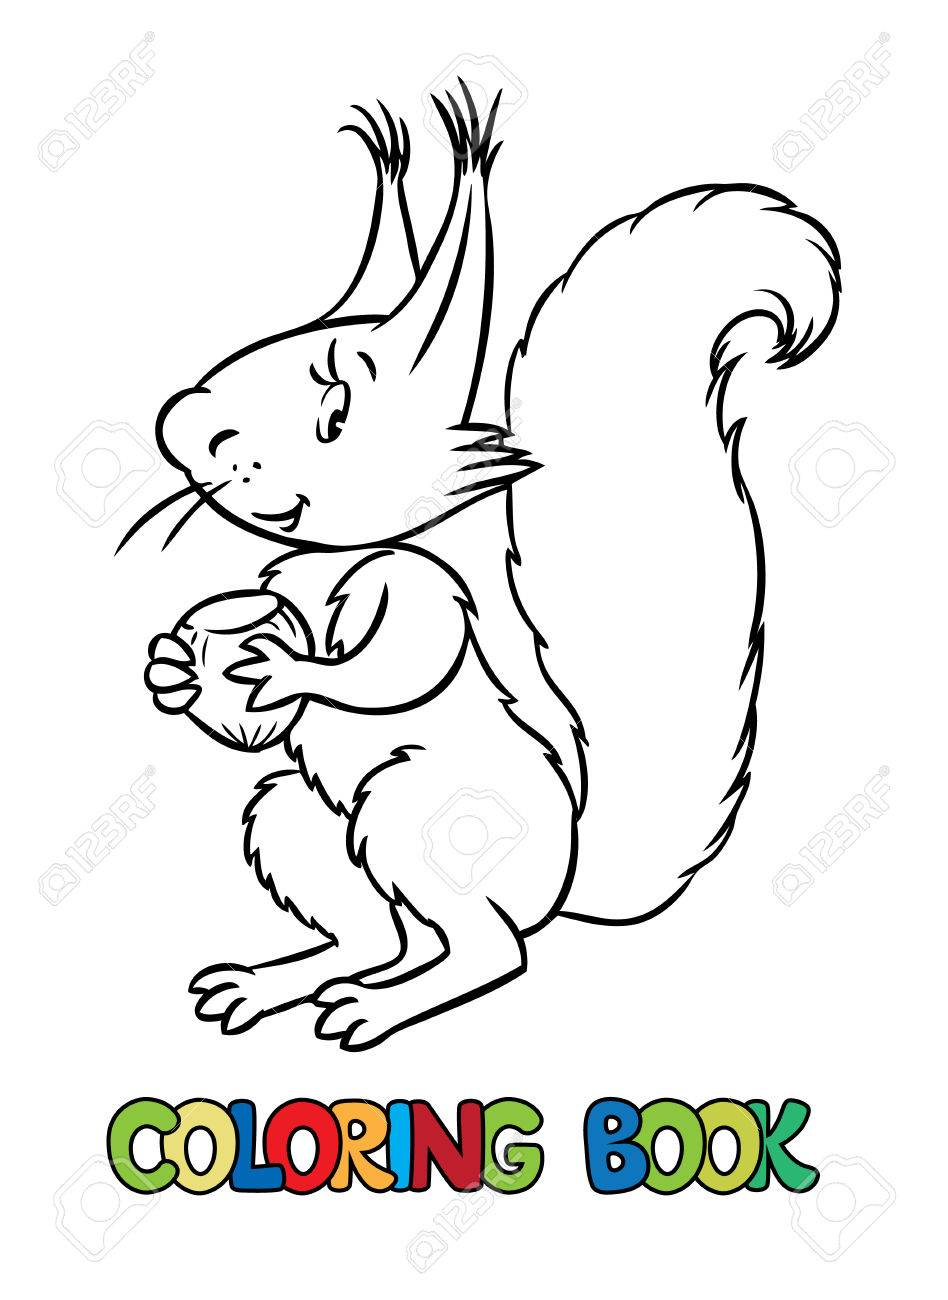 Libro Para Colorear O Dibujo Para Colorear De Ardilla Divertida ...